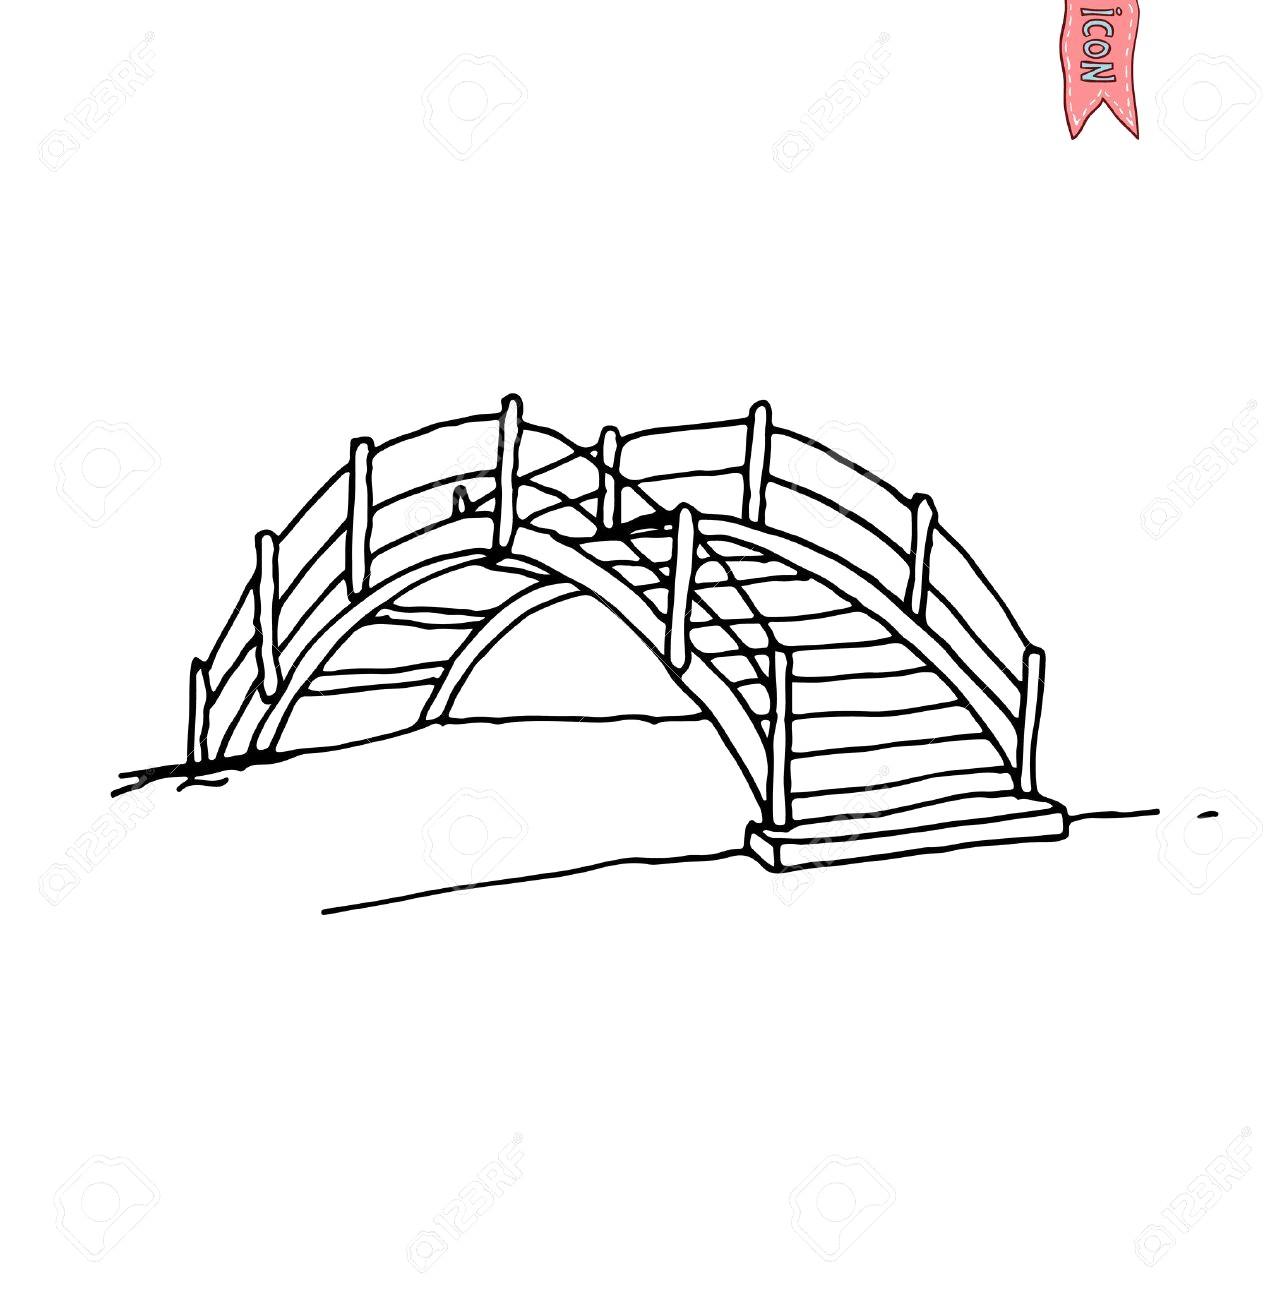 1287x1300 45004592 Wooden Arch Bridge Vector Illustration 15 Clipart